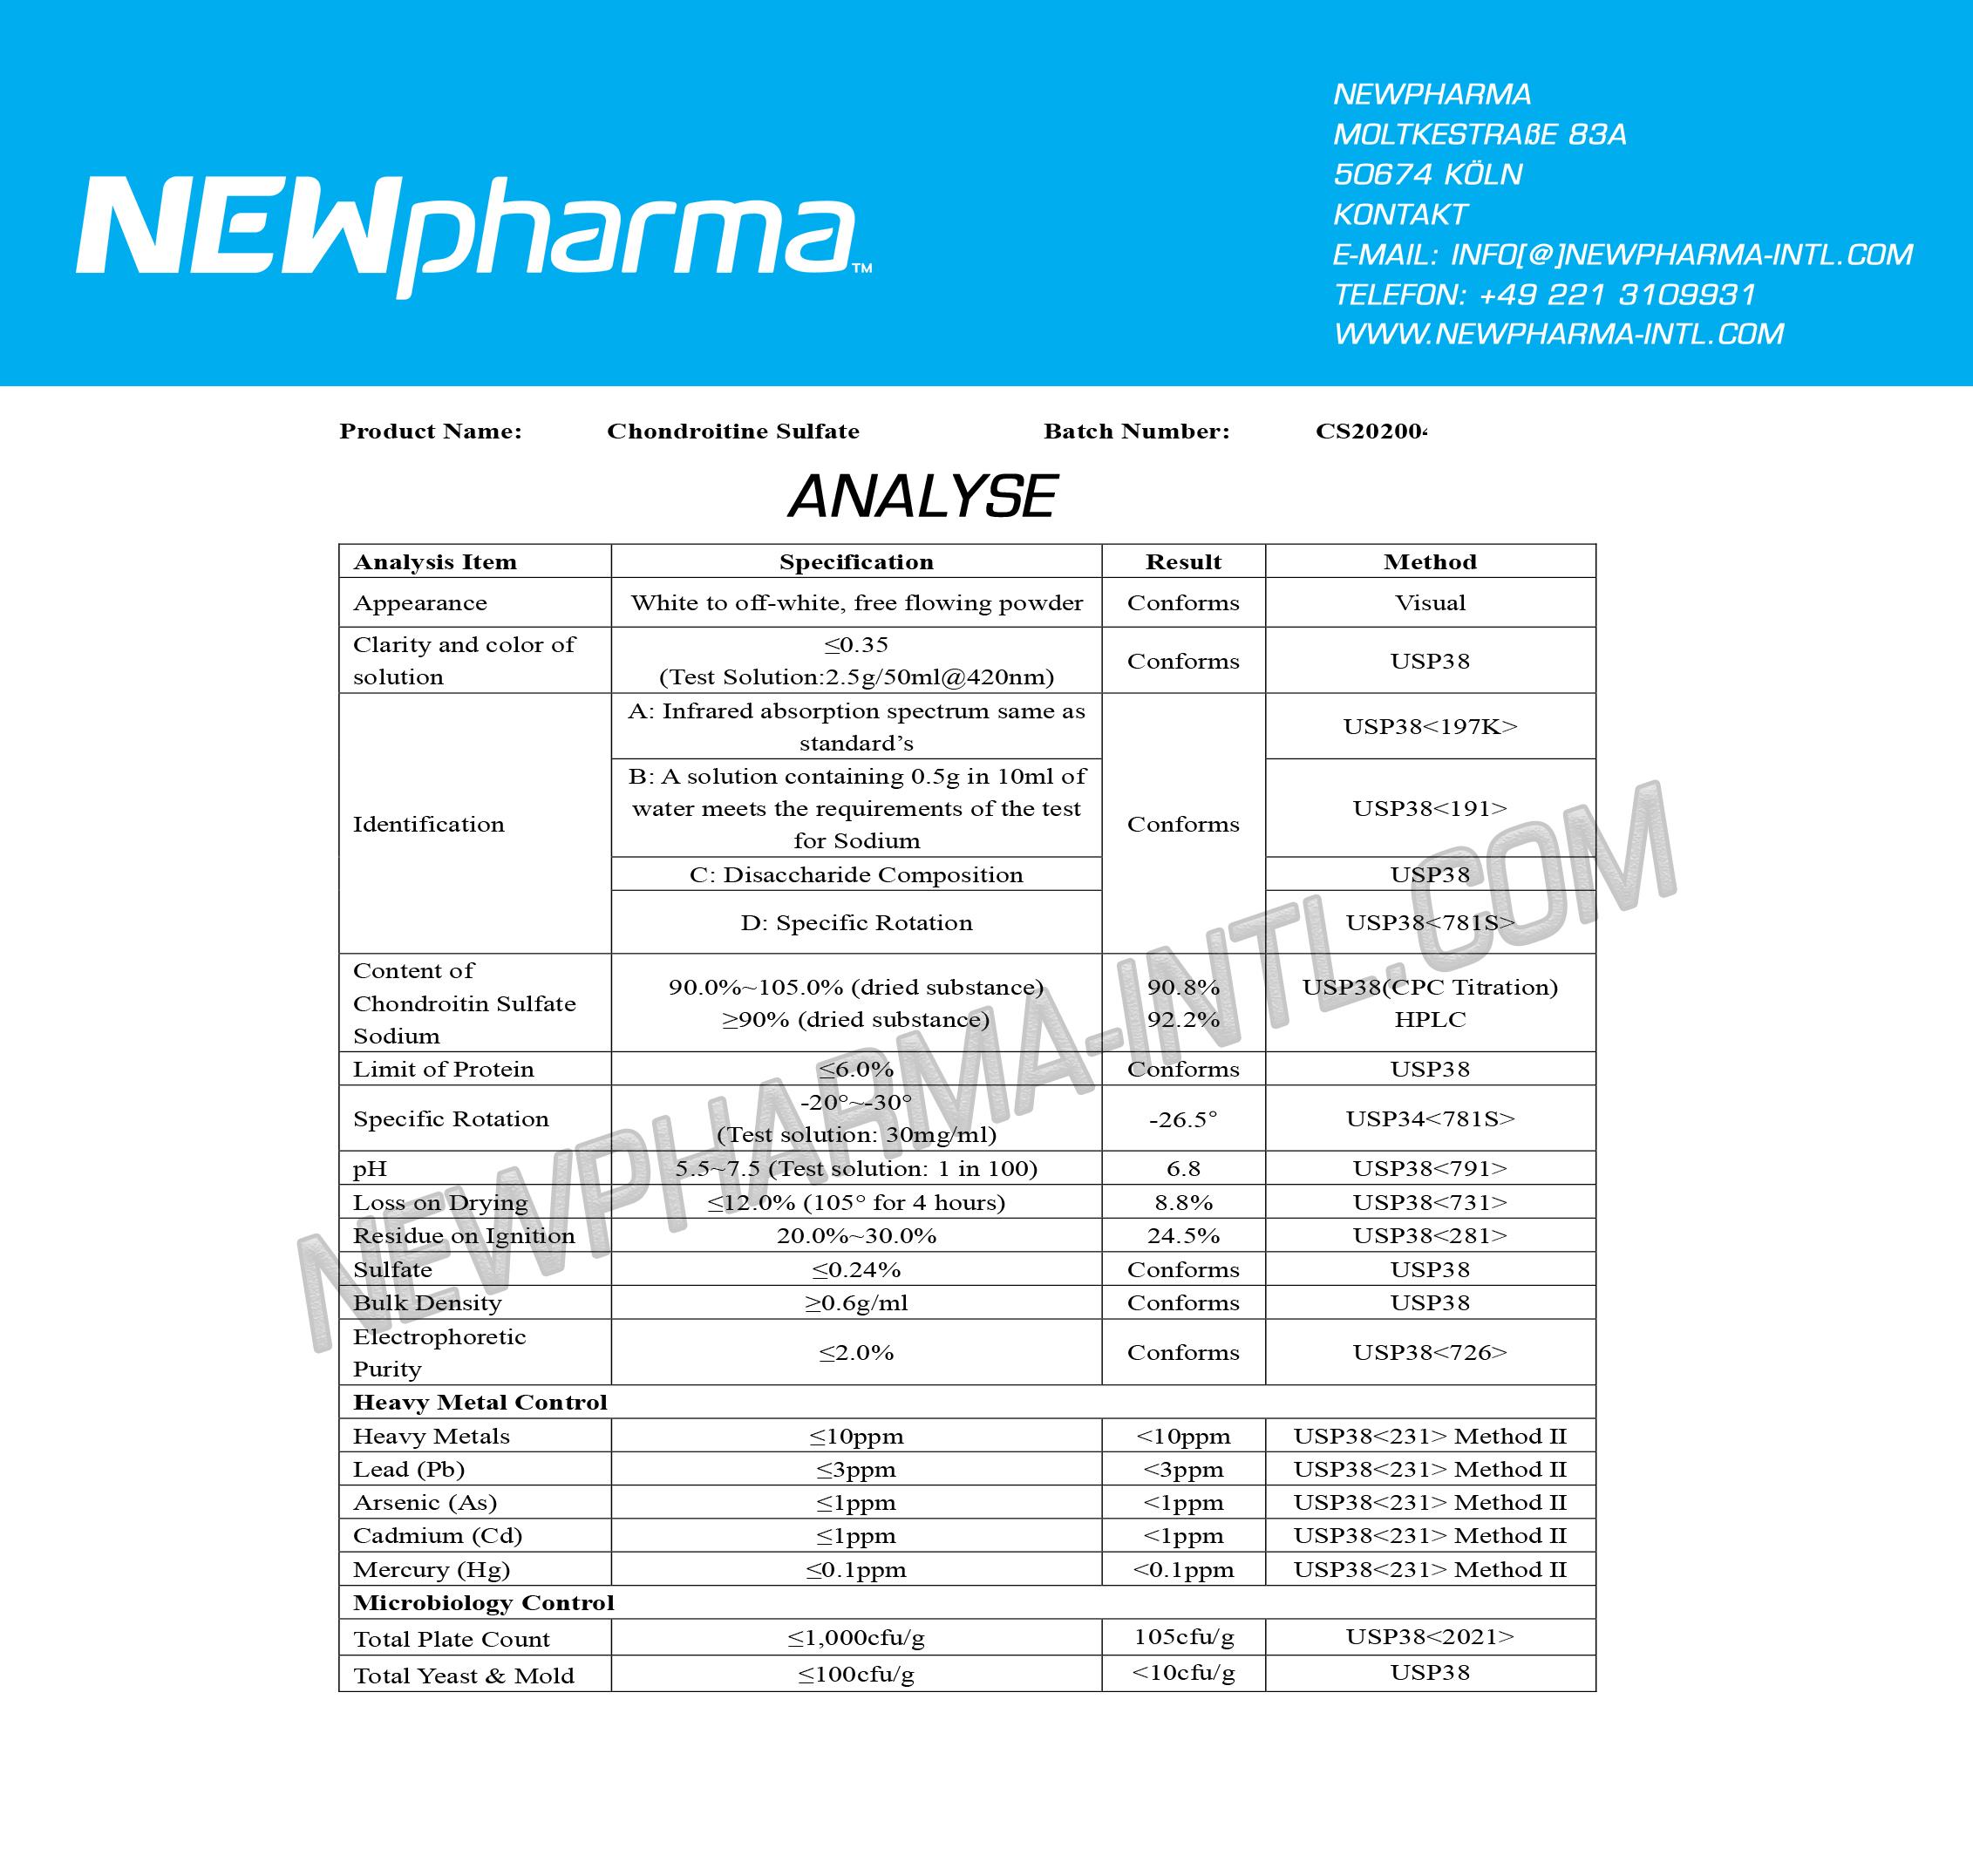 NEWPHARMA-Chondroitine-Sulfat-1